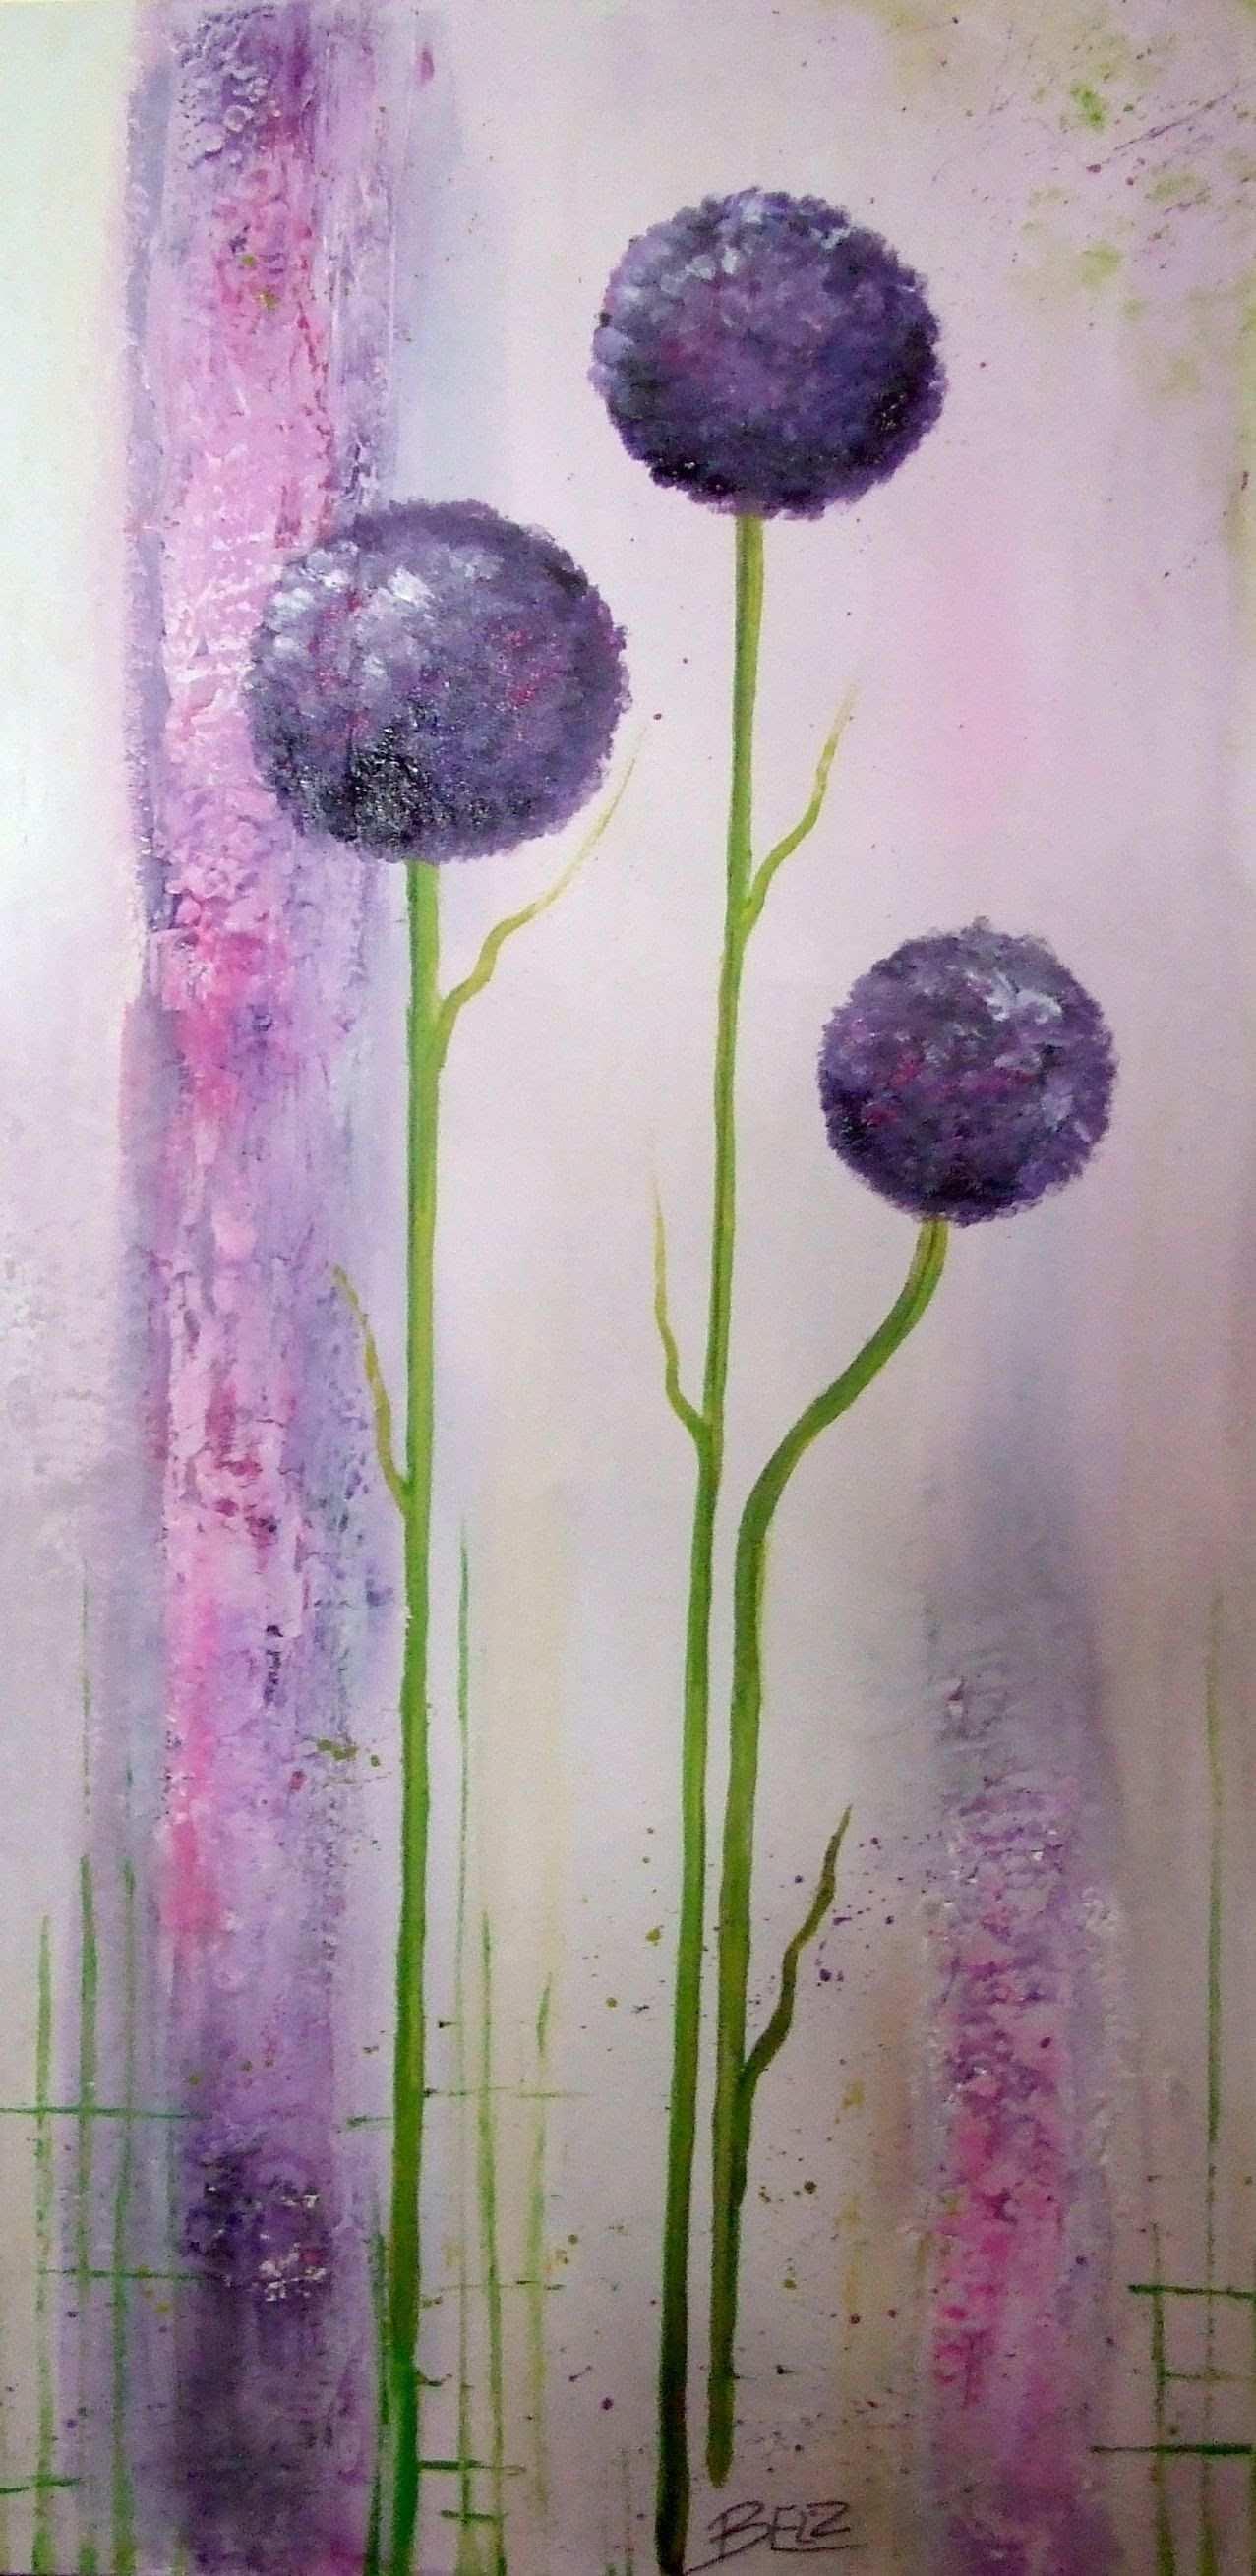 Painting Demo Ornamental Onion Acrylmalerei Lange Version Blumen Malen Acryl Acrylbilder Blumen Acrylmalerei